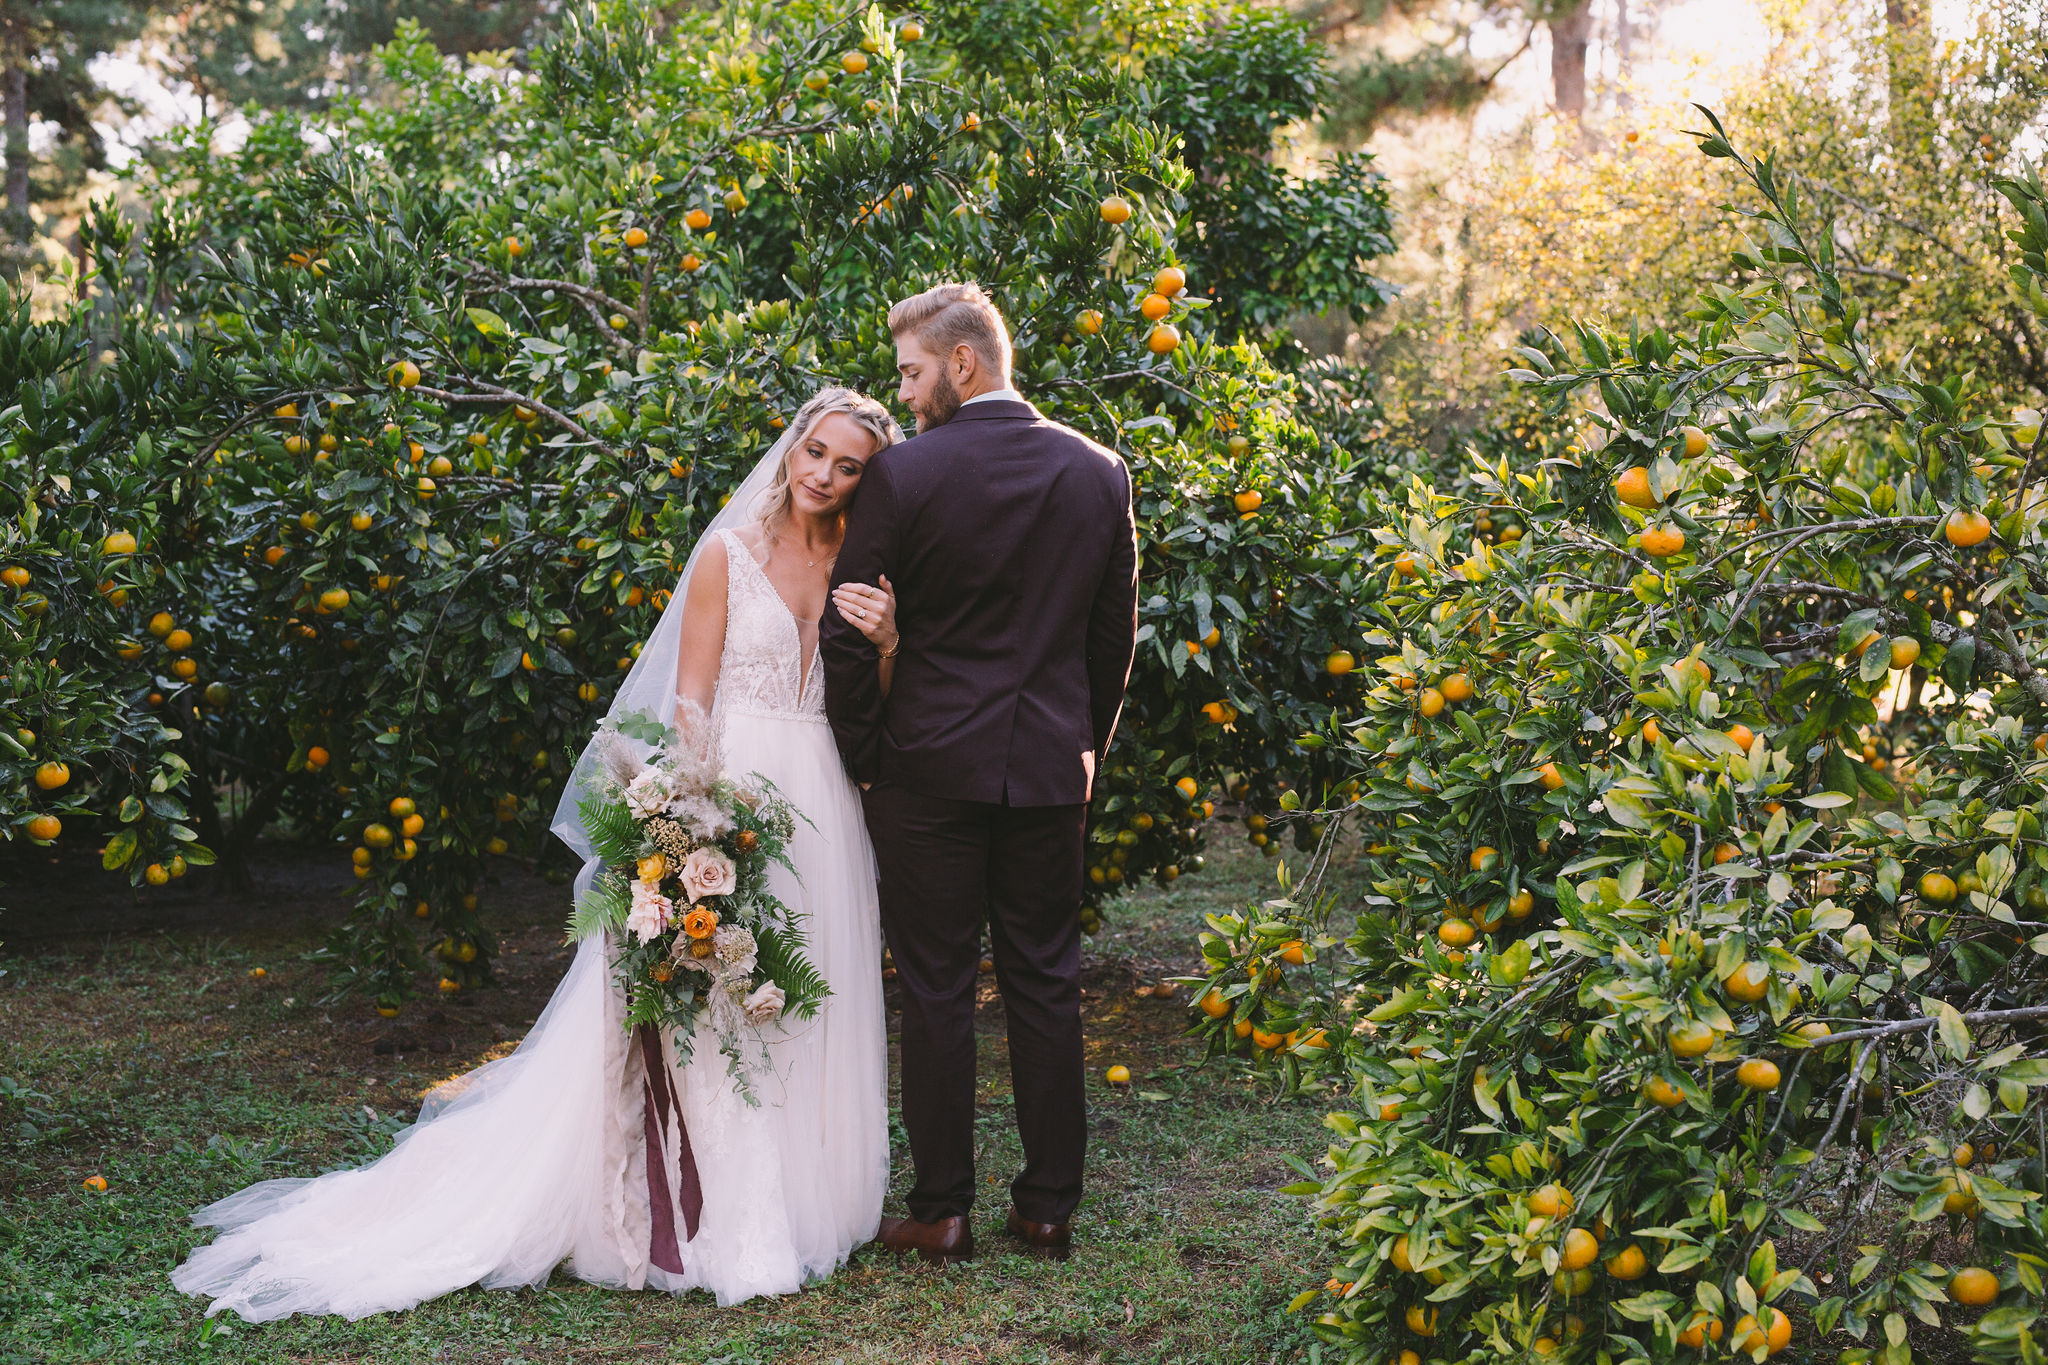 Jesseandlex_181103_AlexisNate_Wedding_BrideGroom_068.jpg